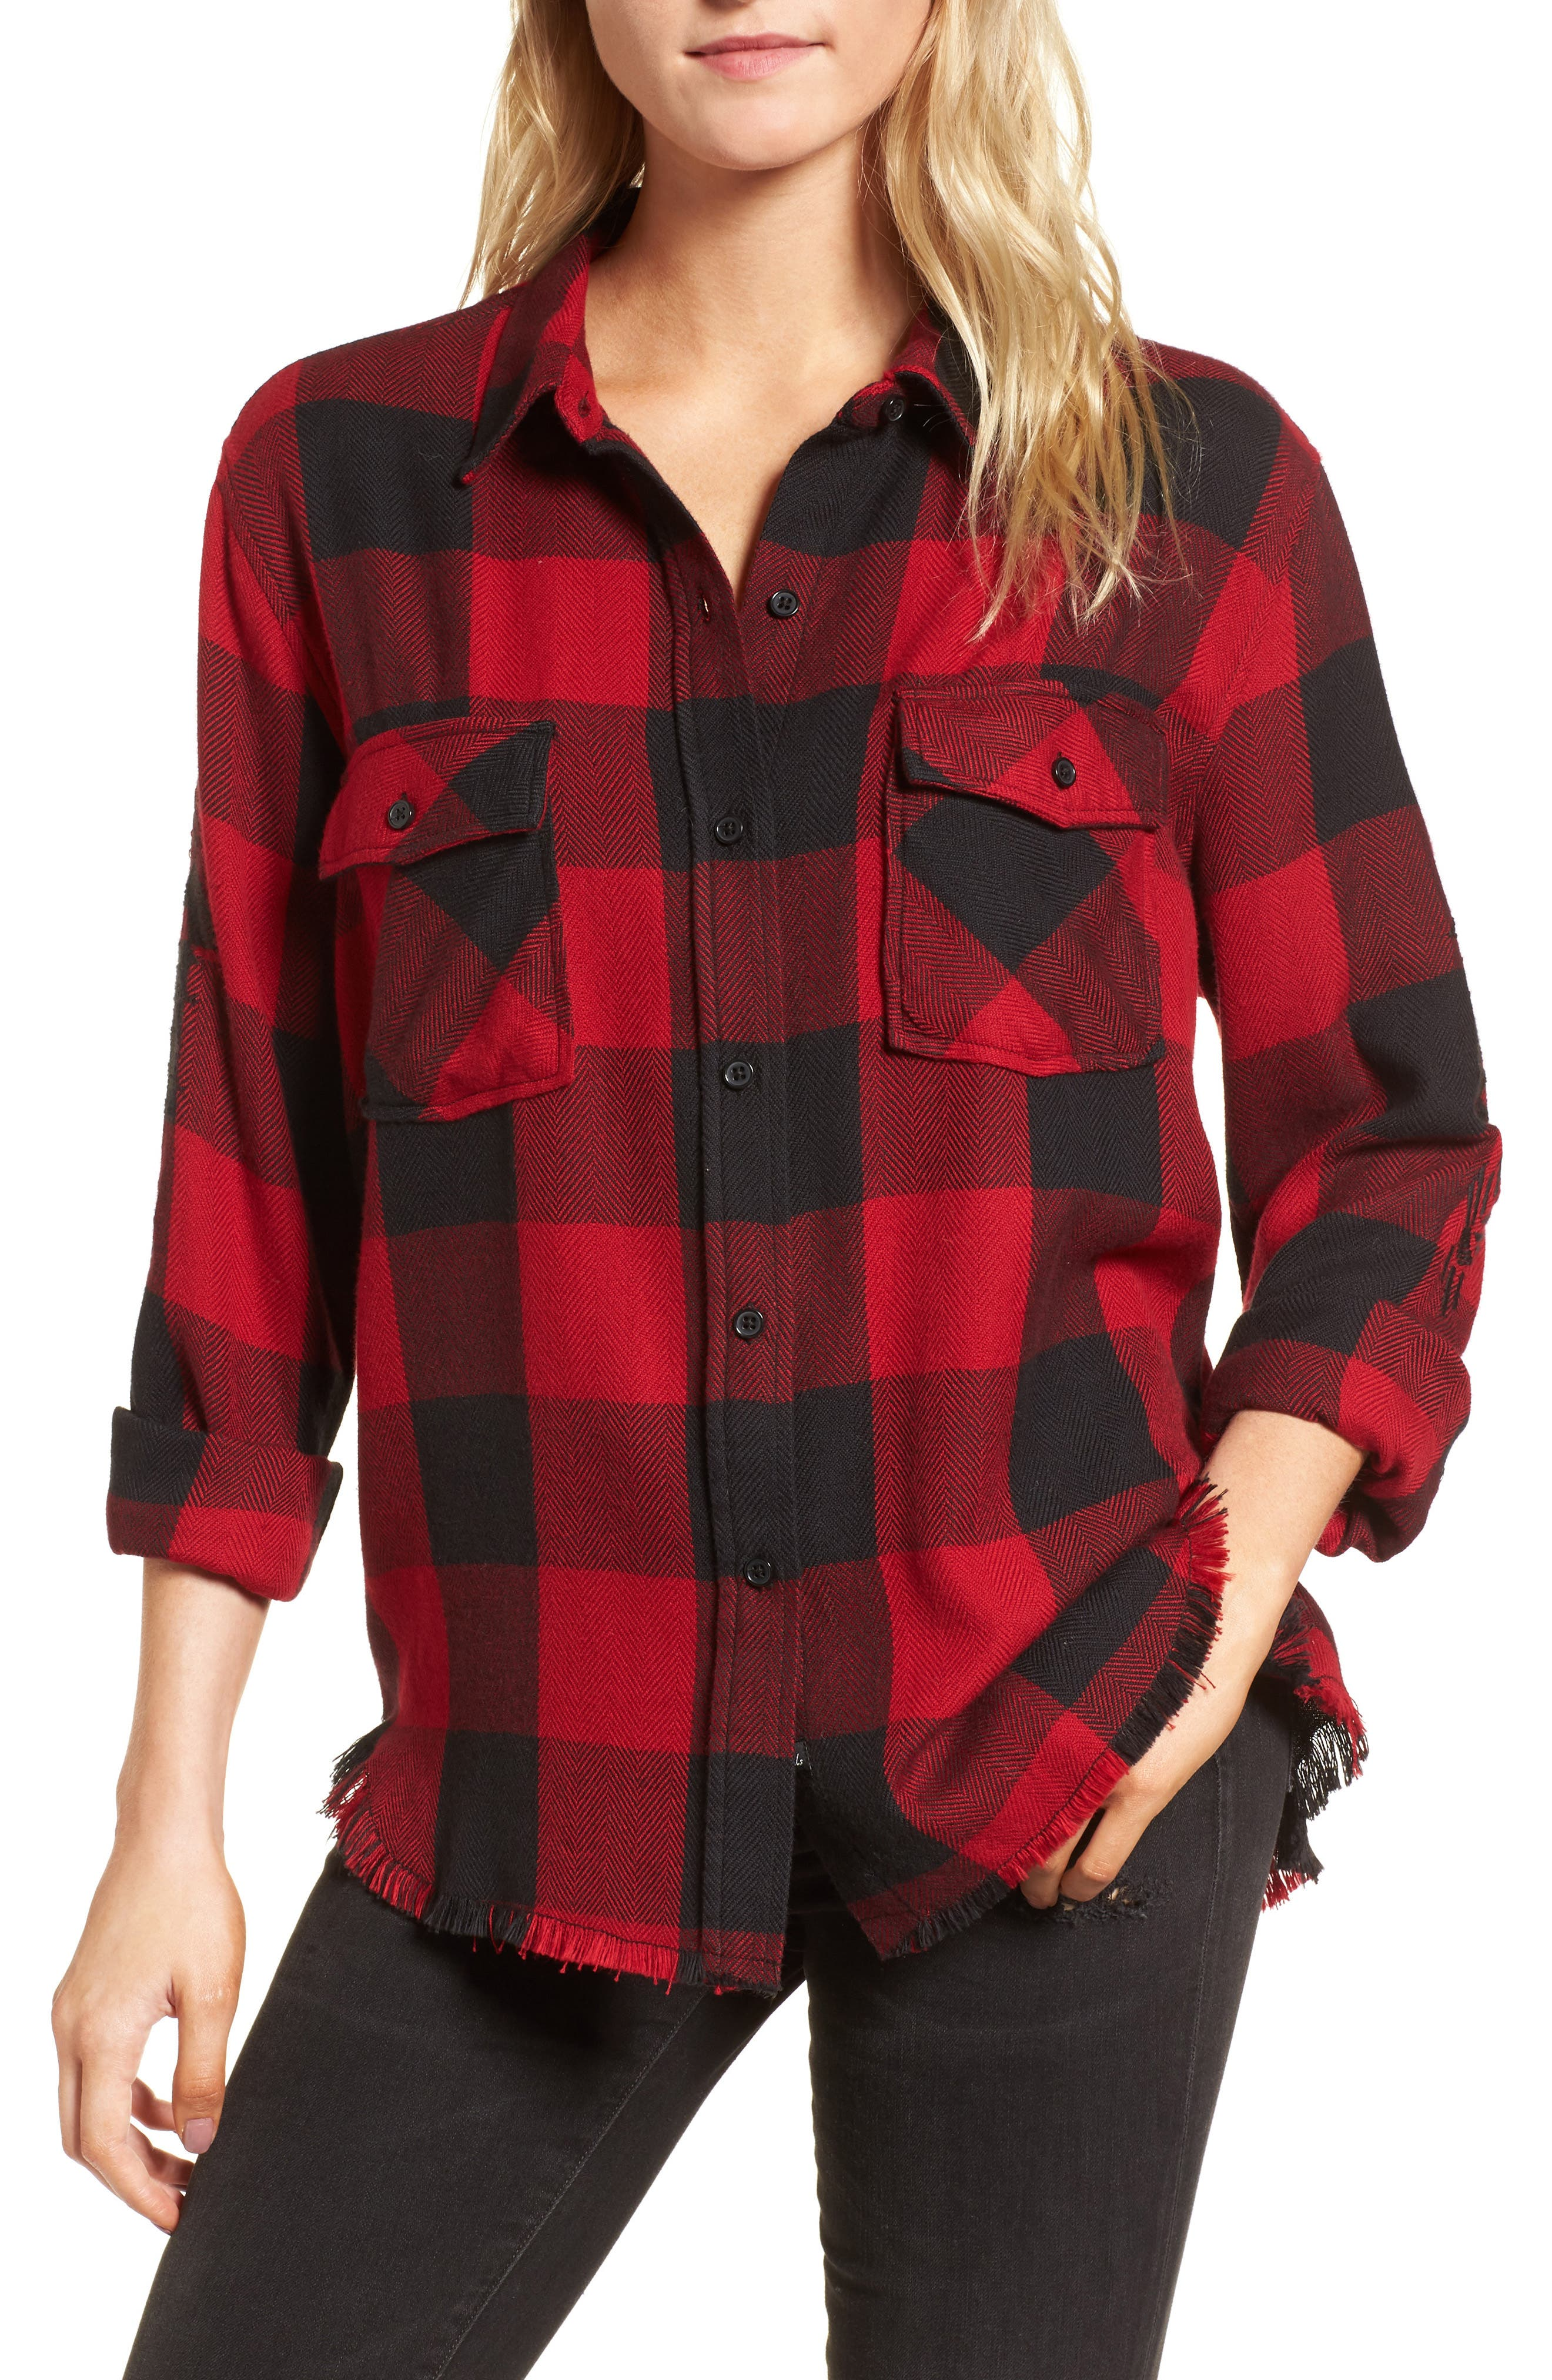 Larsson Embroidered Flannel Shirt,                             Main thumbnail 1, color,                             Crimson Jet